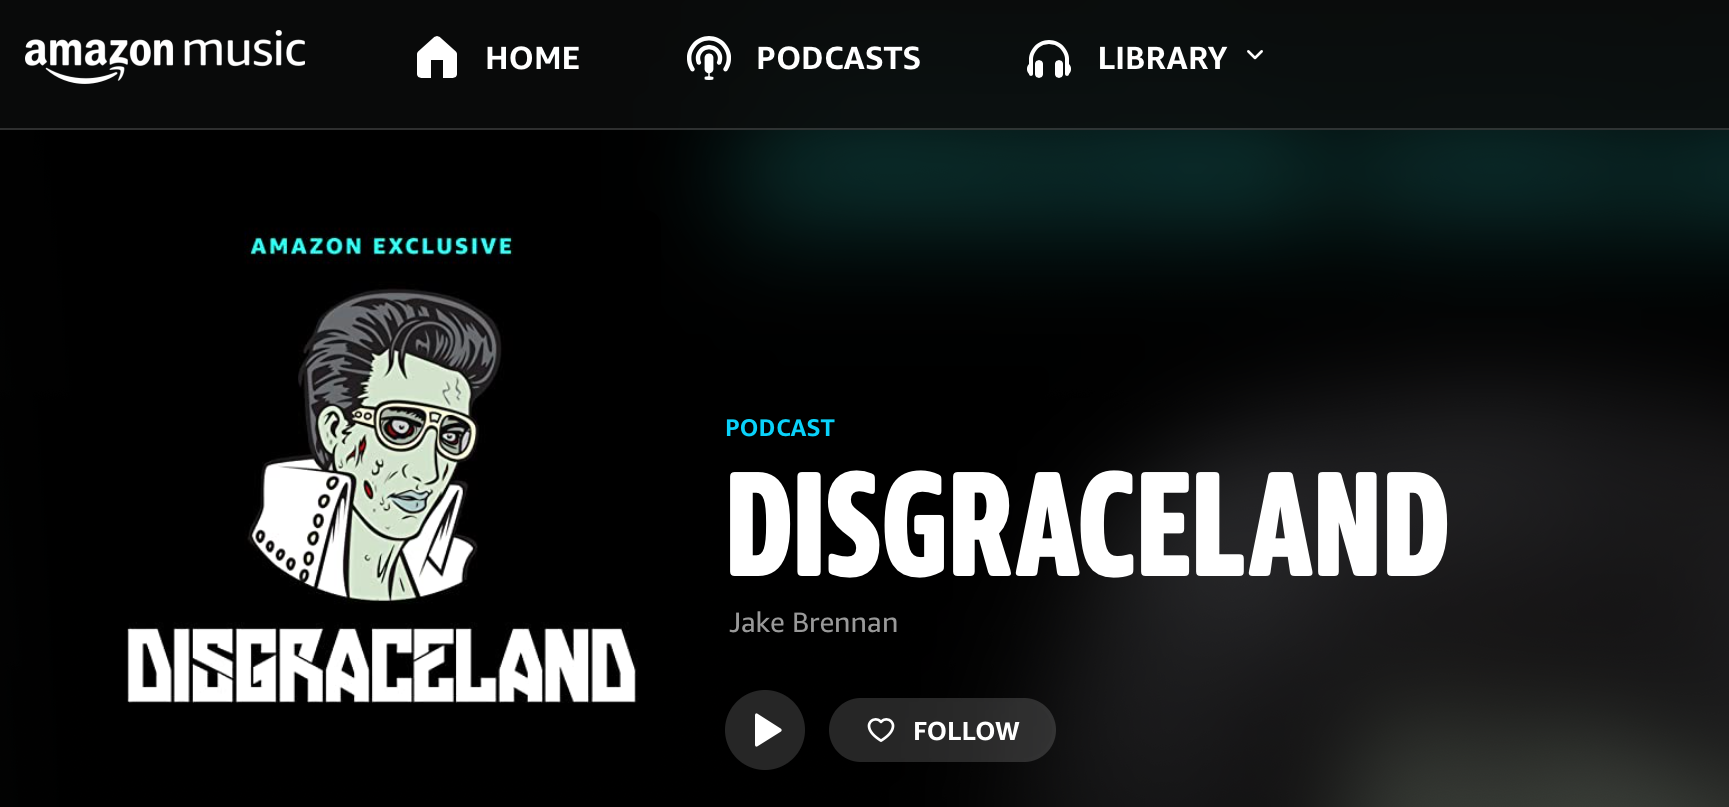 Amazon Music Podcast DIsgraceland